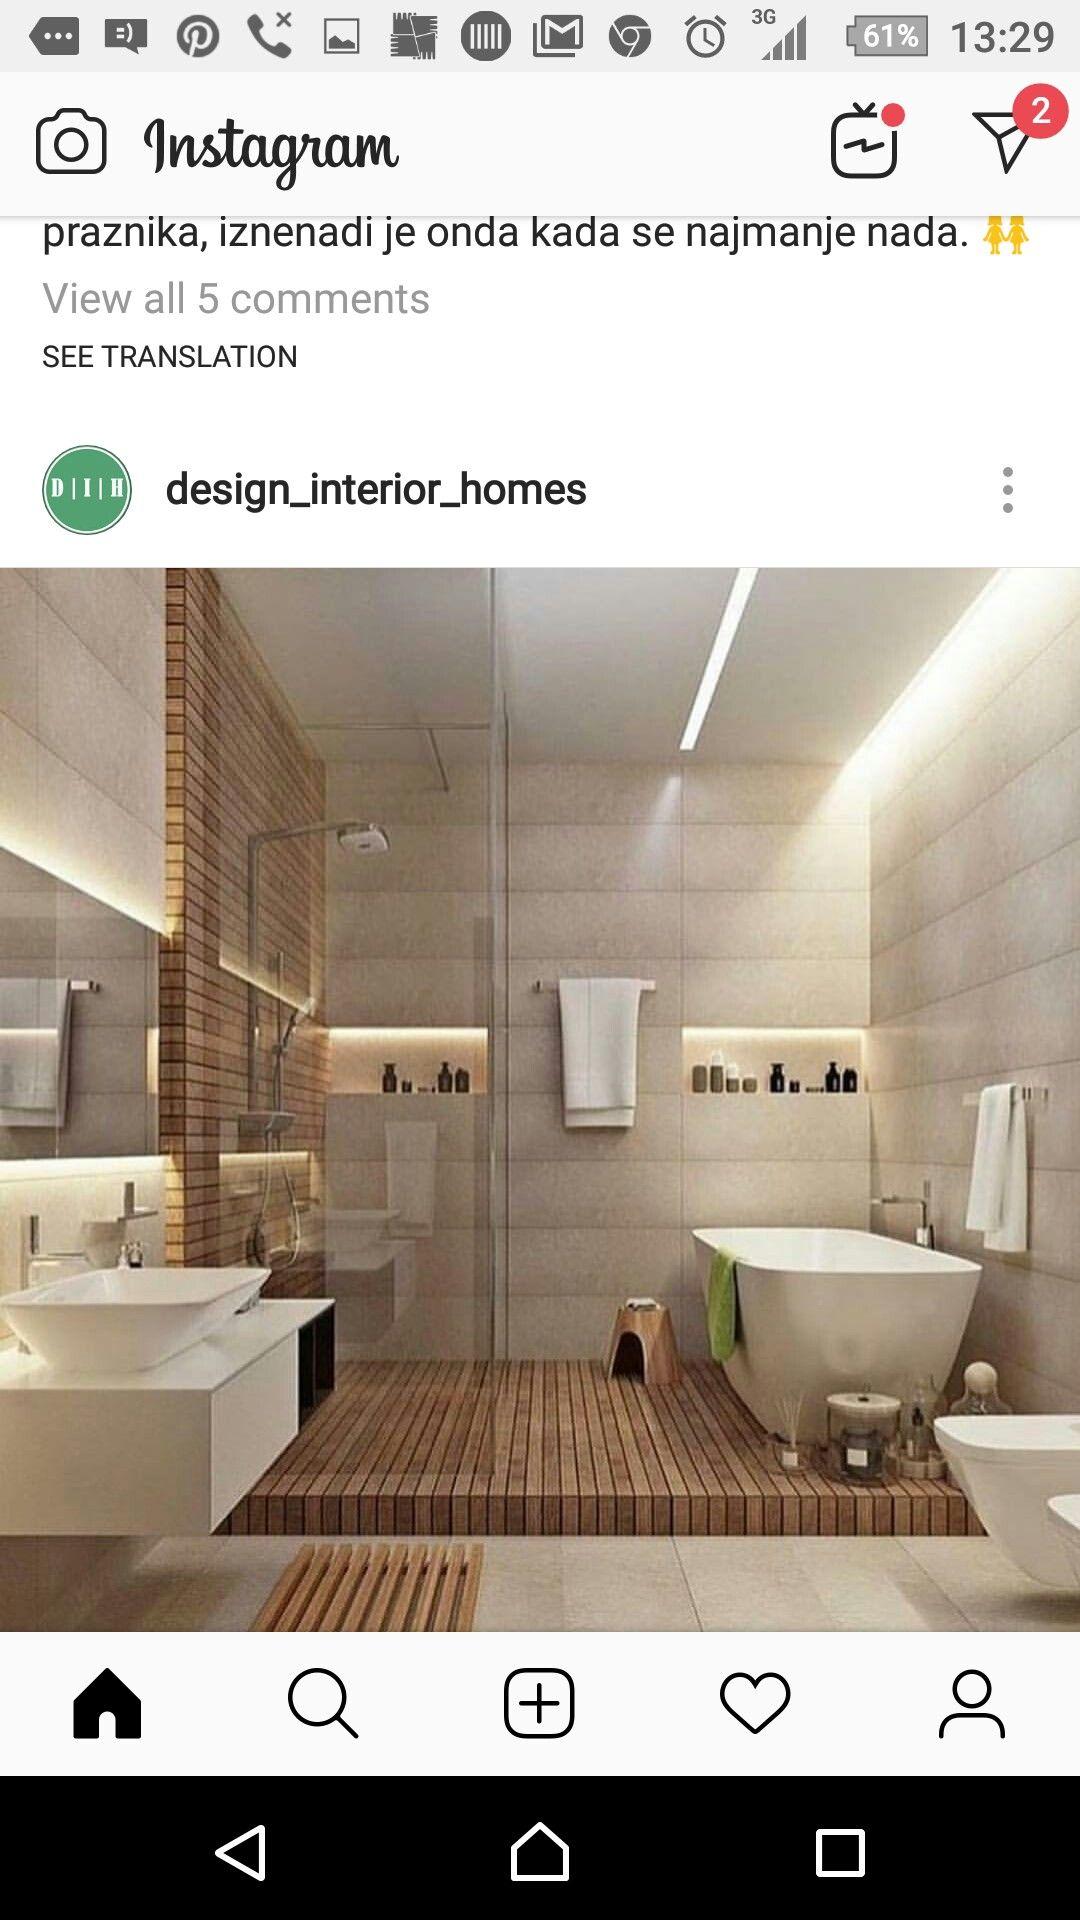 Pin By Iustitia Hathor On Kupatilo Ideje Bathroom Design Small Bathroom Design Bathroom Interior Design